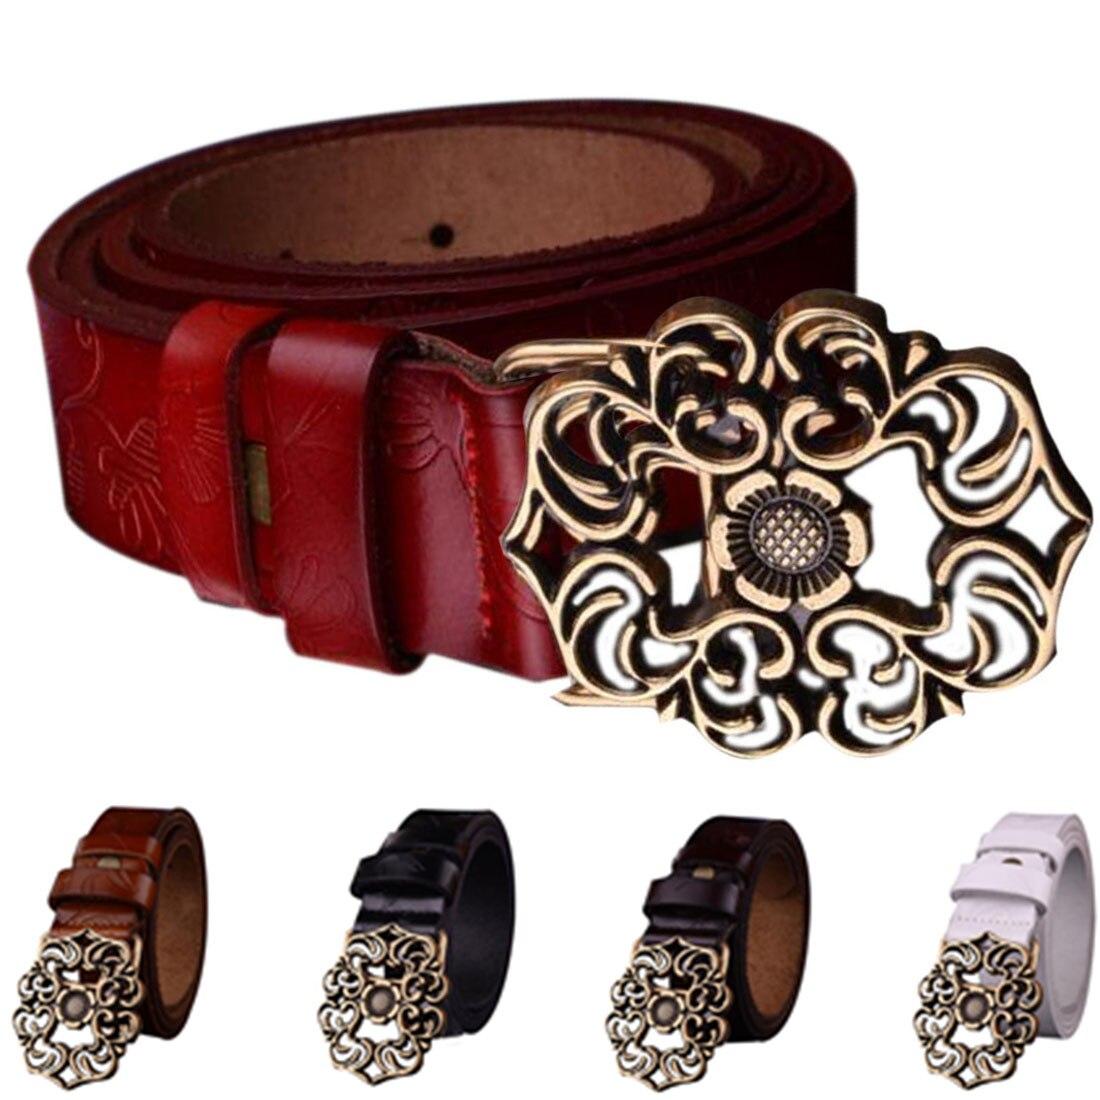 2017 Vintage Style Fashion Women Genuine Leather Metal Flower Buckle Belt Casual Waist Strap